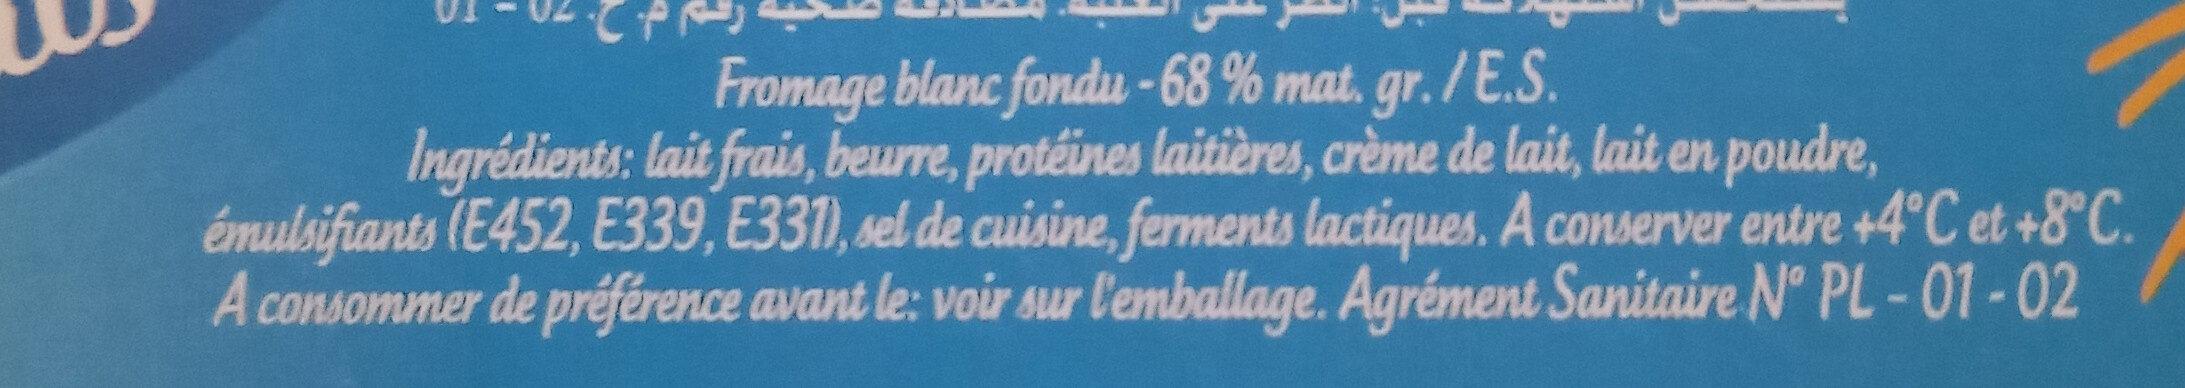 Frommage carré - المكونات - fr